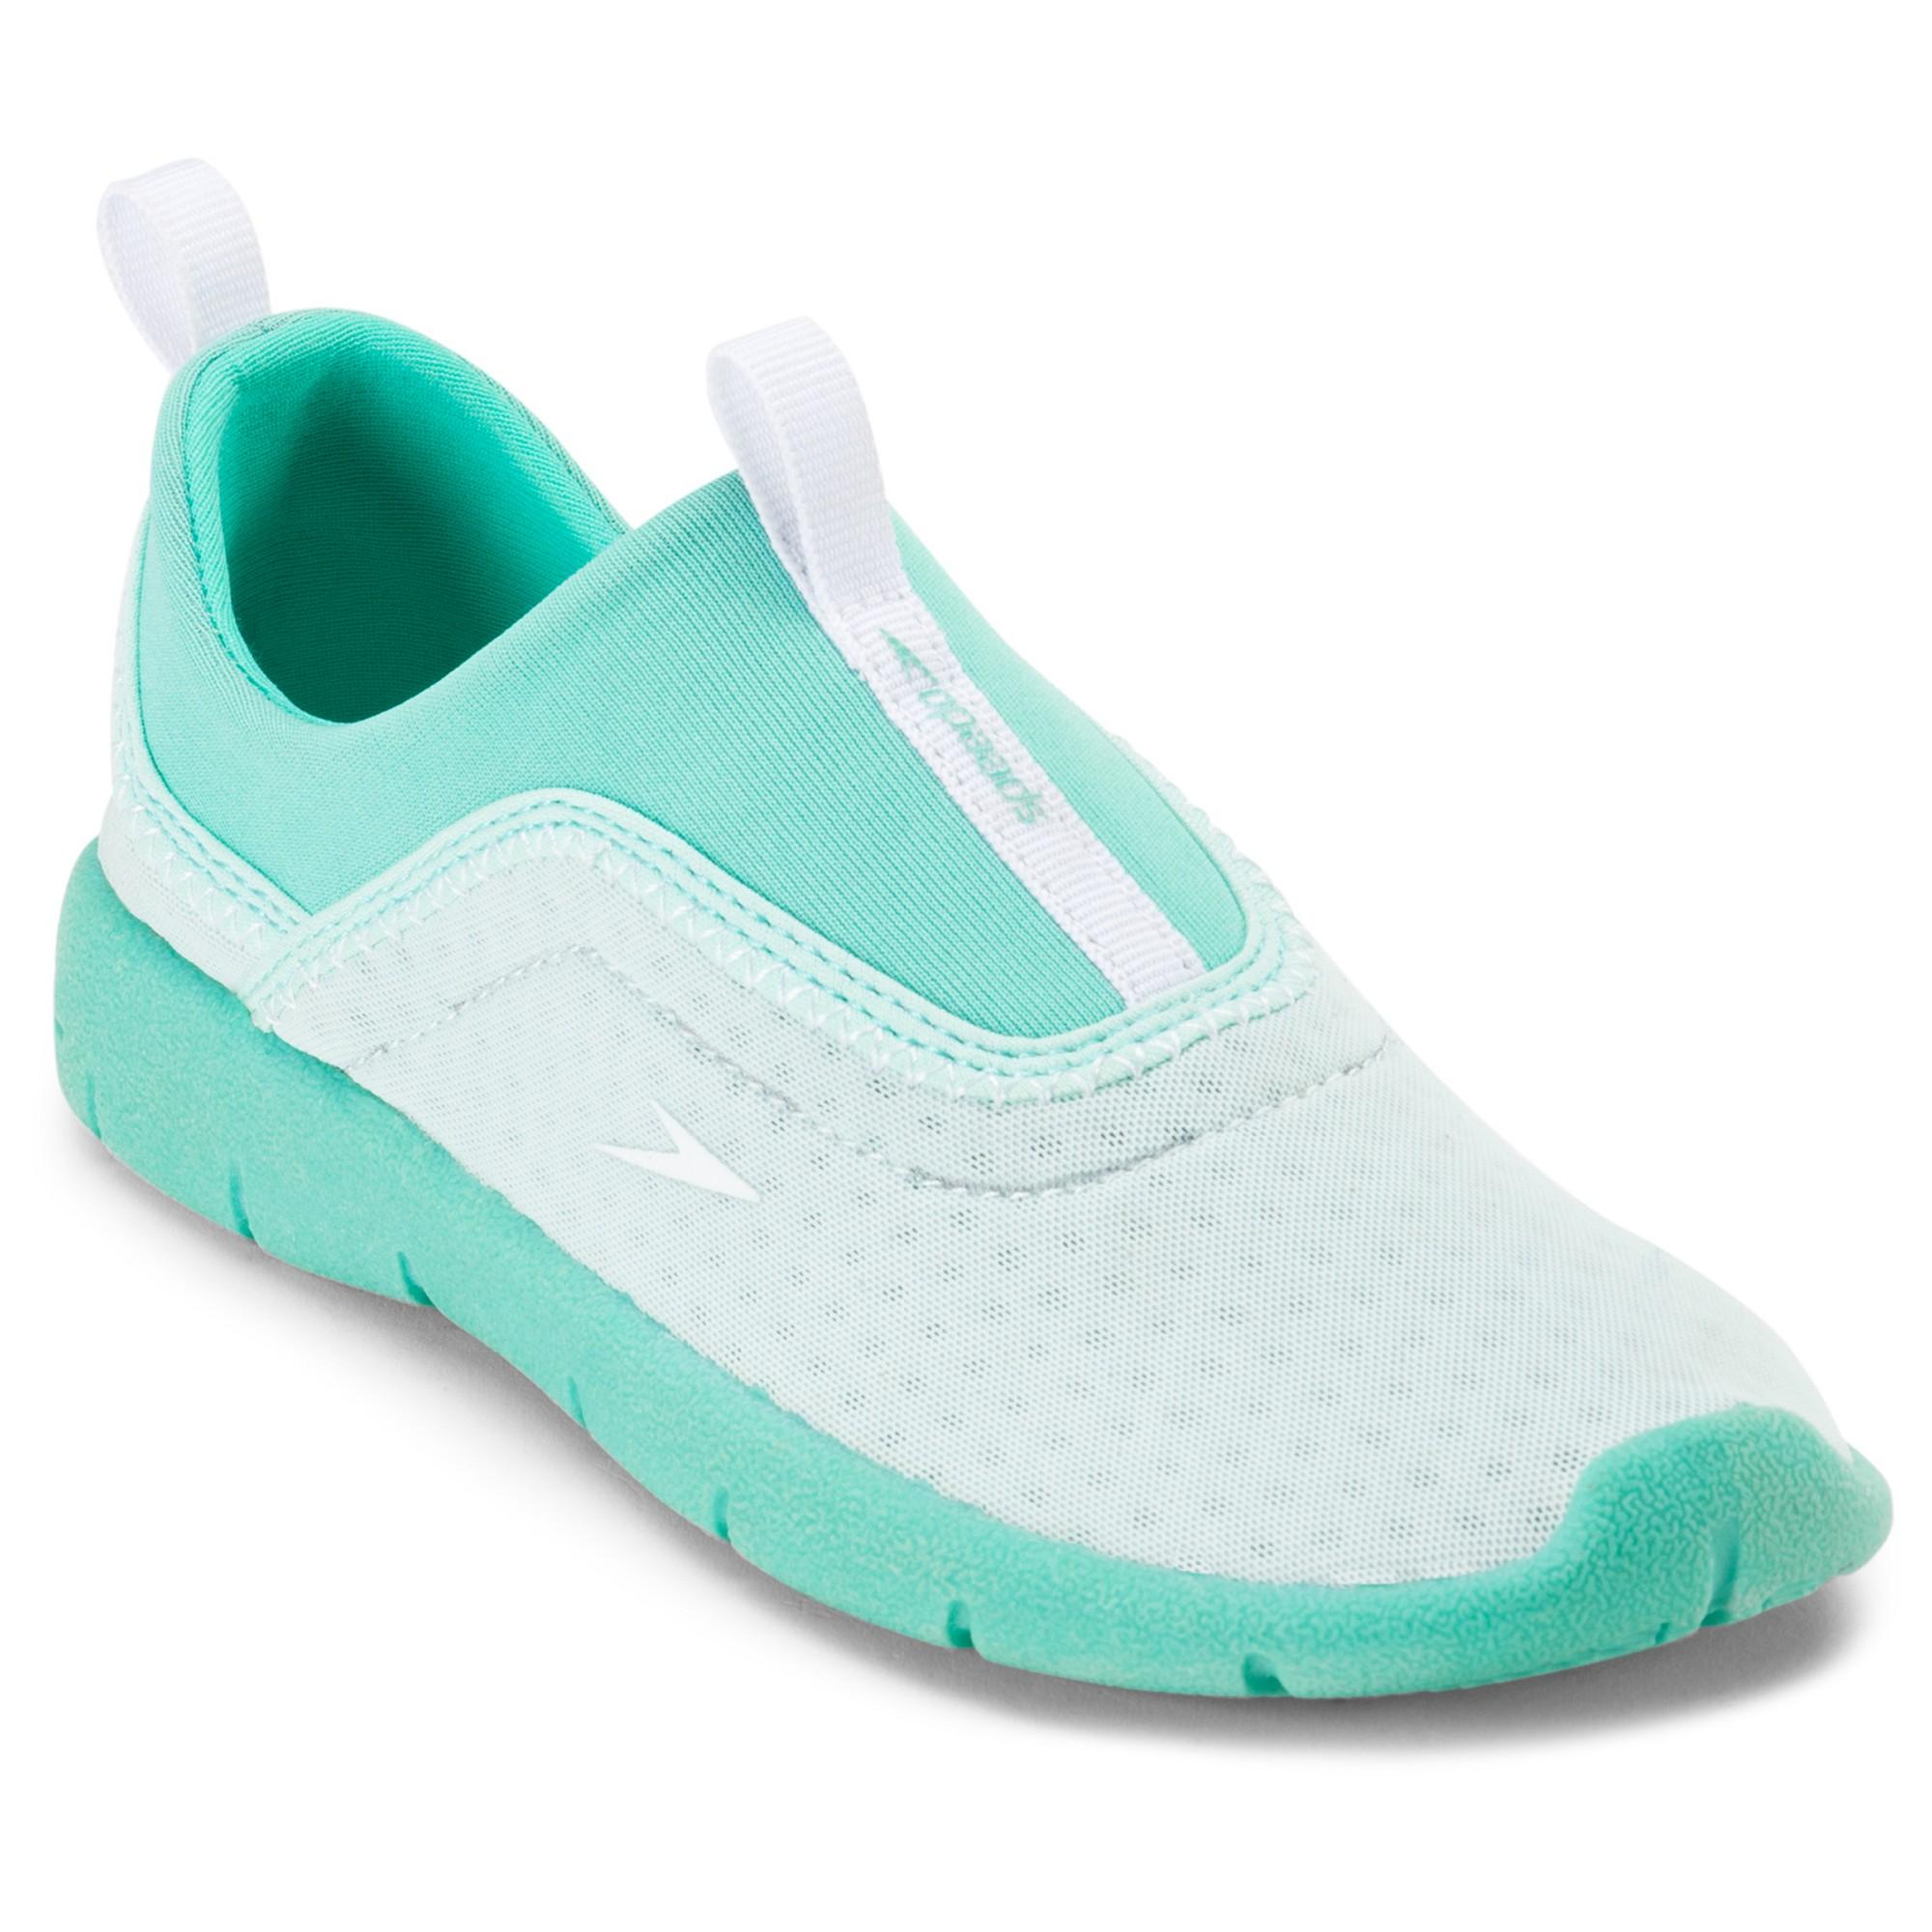 3f95b6e1644b Speedo Junior Kids Aqua (Blue)skimmer Water Shoes - Aqua (Medium ...